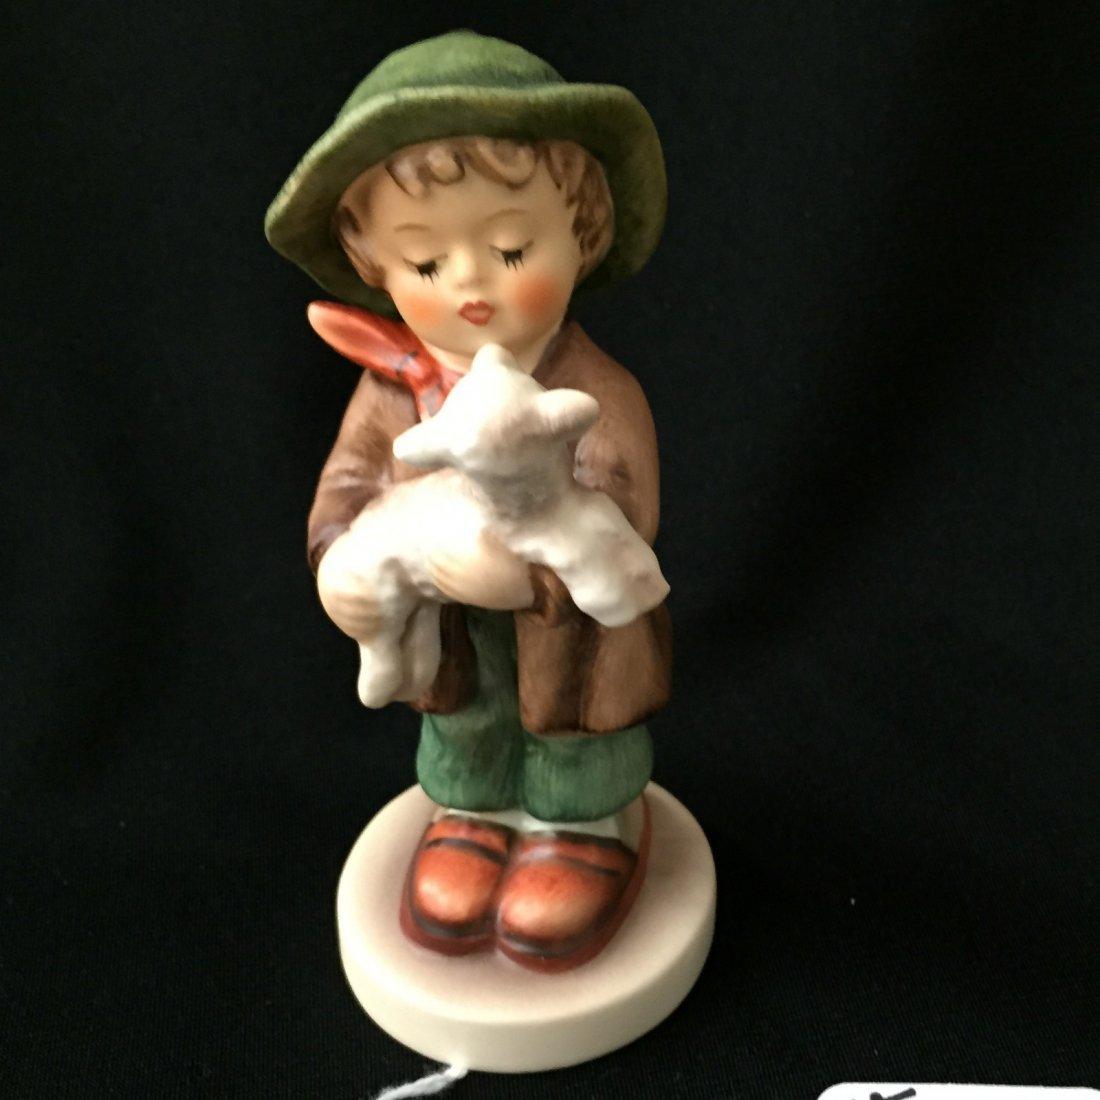 Hummel Figurine: Lost Sheep; #68/2/0 TM 6. Book Value